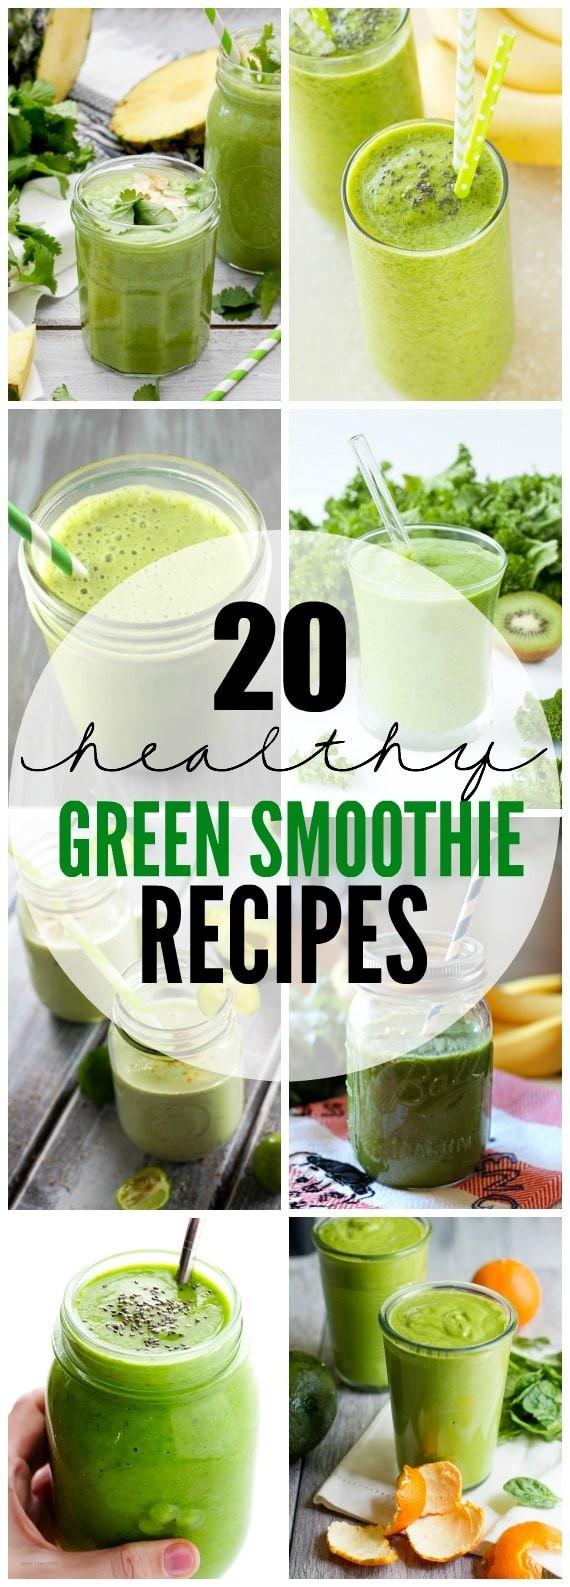 Smoothie Recipes Healthy  Foods for Children s Dental Health Health Alliance Blog